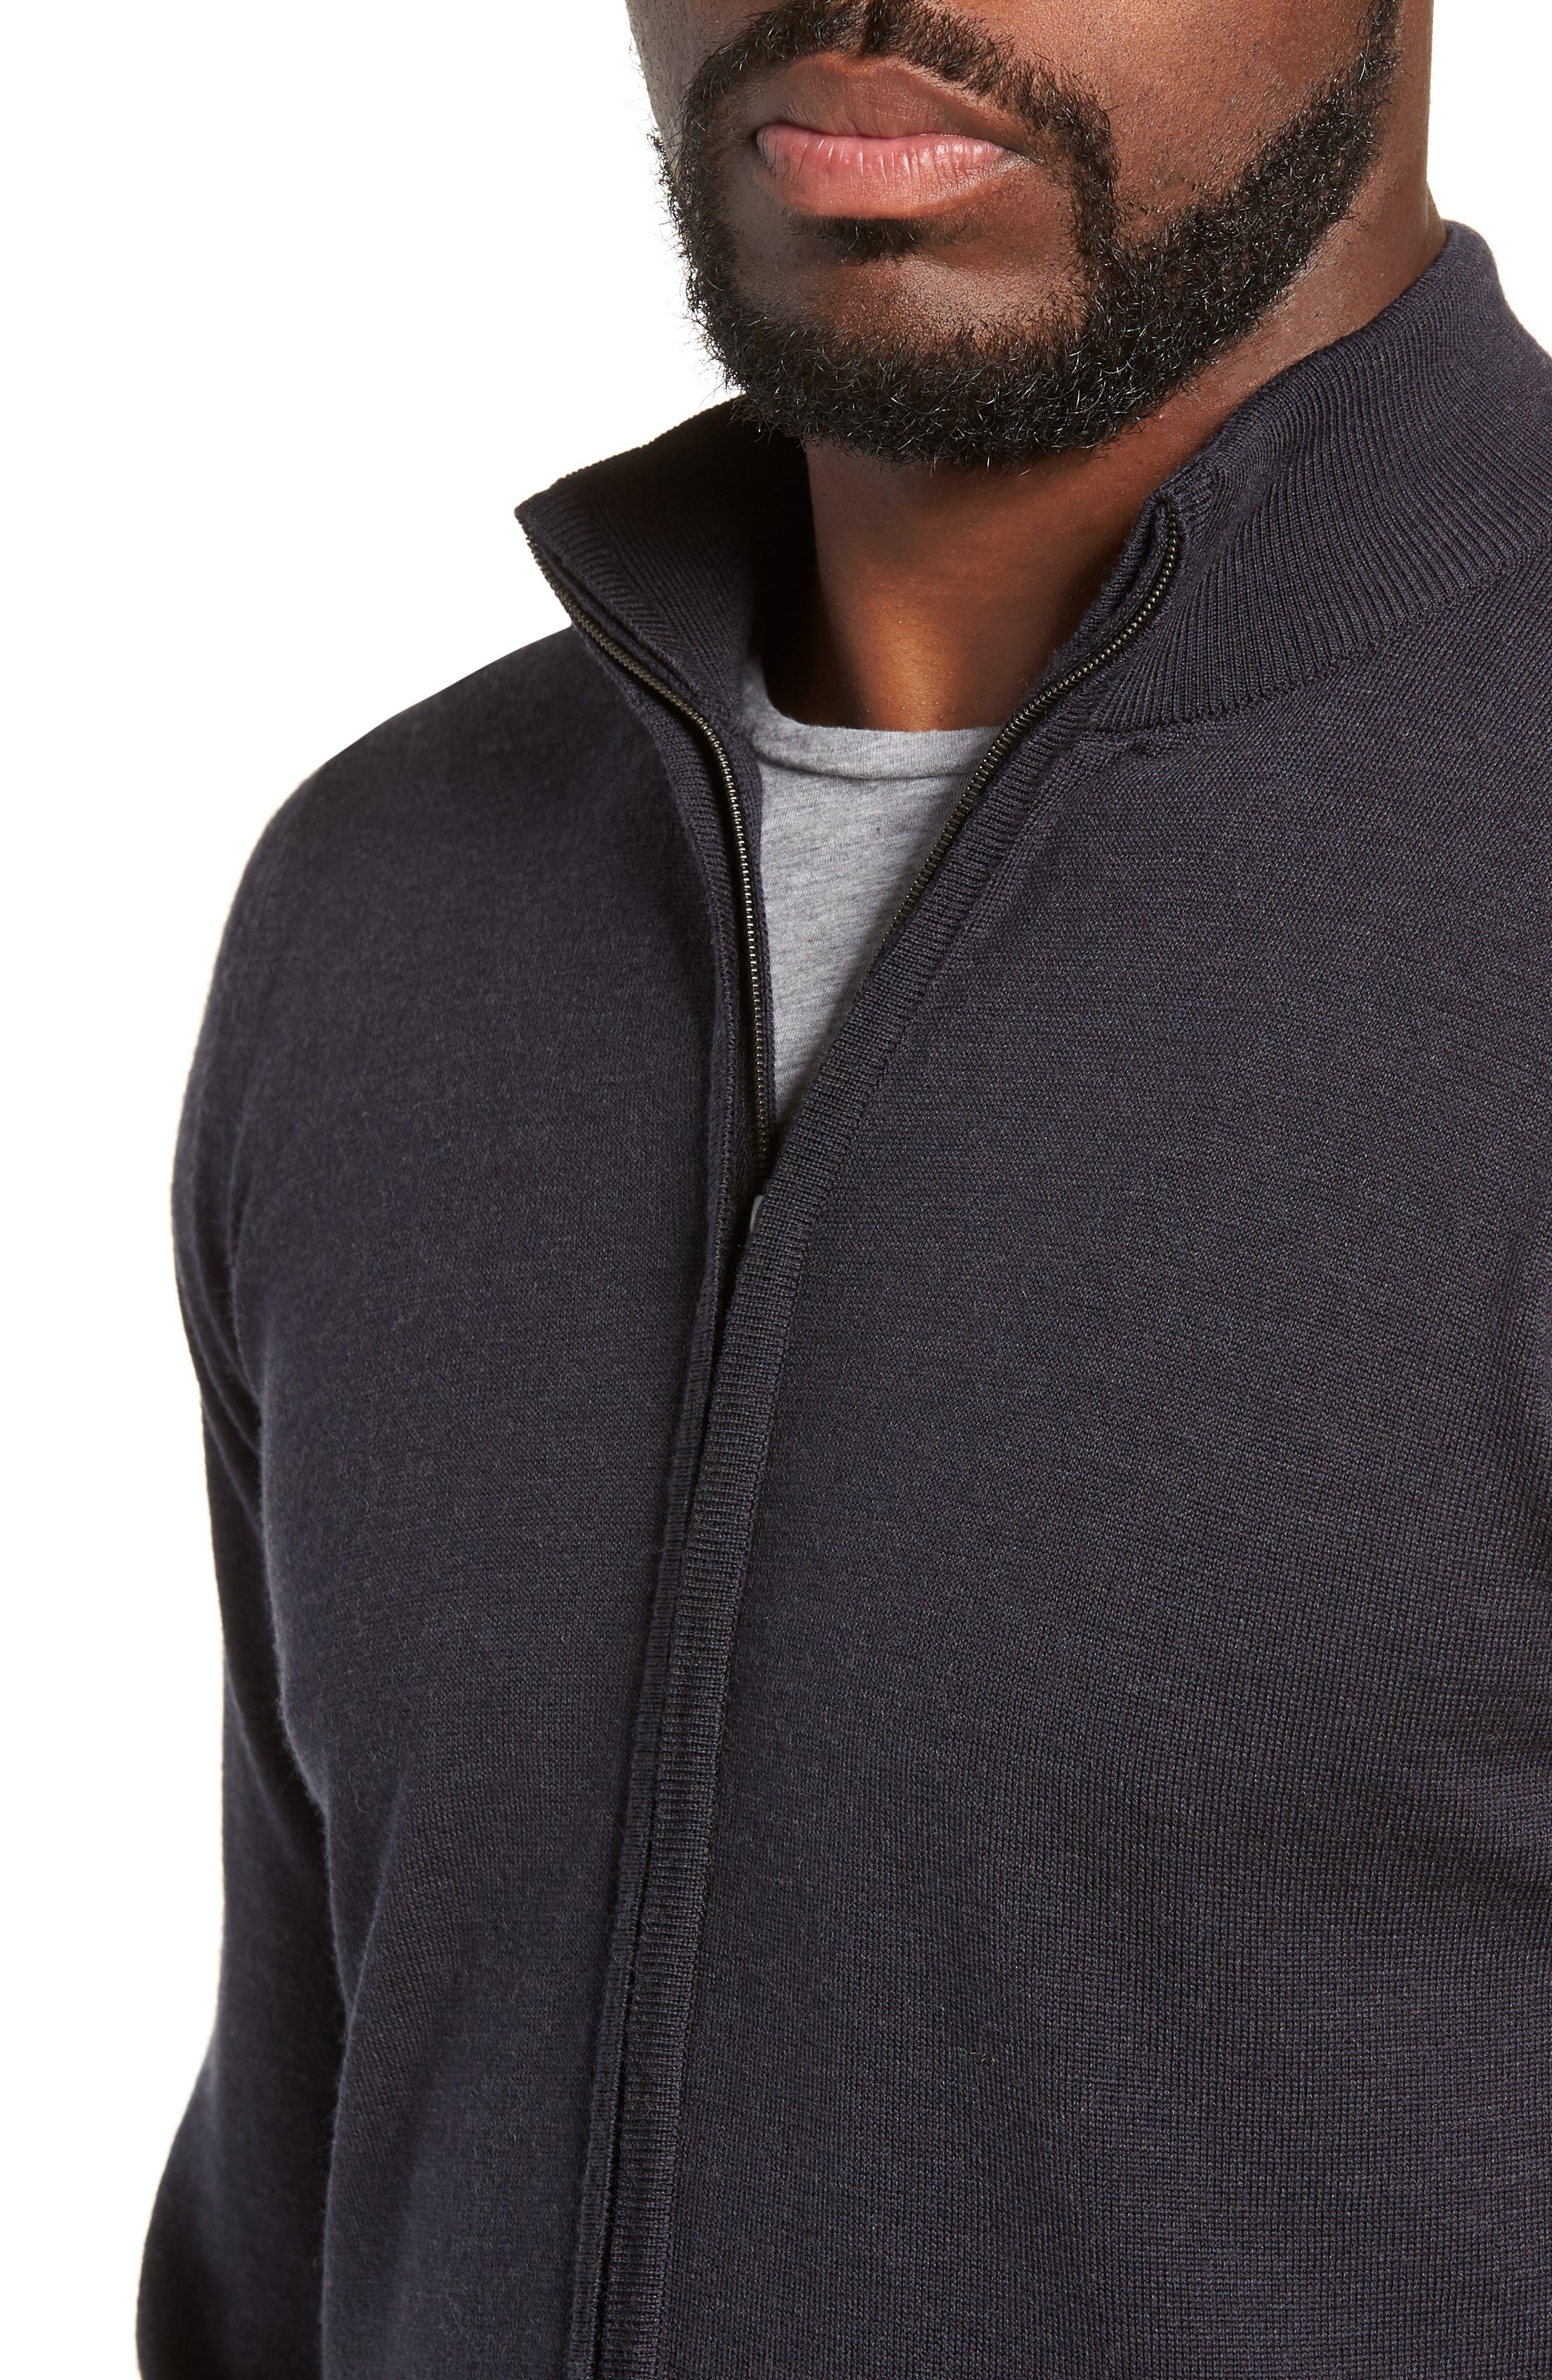 Claygate Slim Fit Merino Wool Zip Jacket,                             Alternate thumbnail 4, color,                             HEPBURN SMOKE